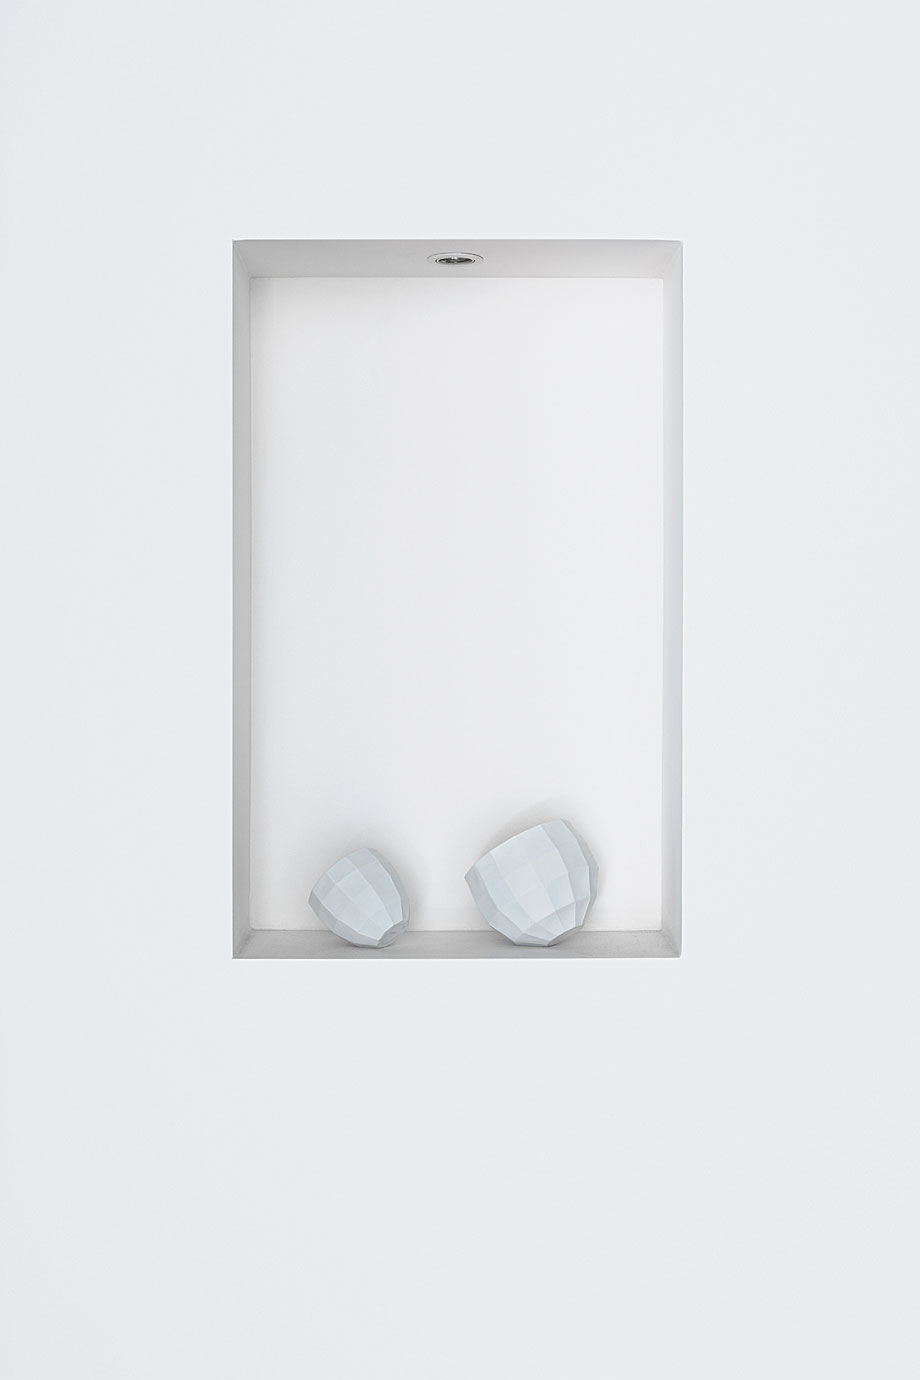 casa-unifamiliar-klanovice-adr-architects-8